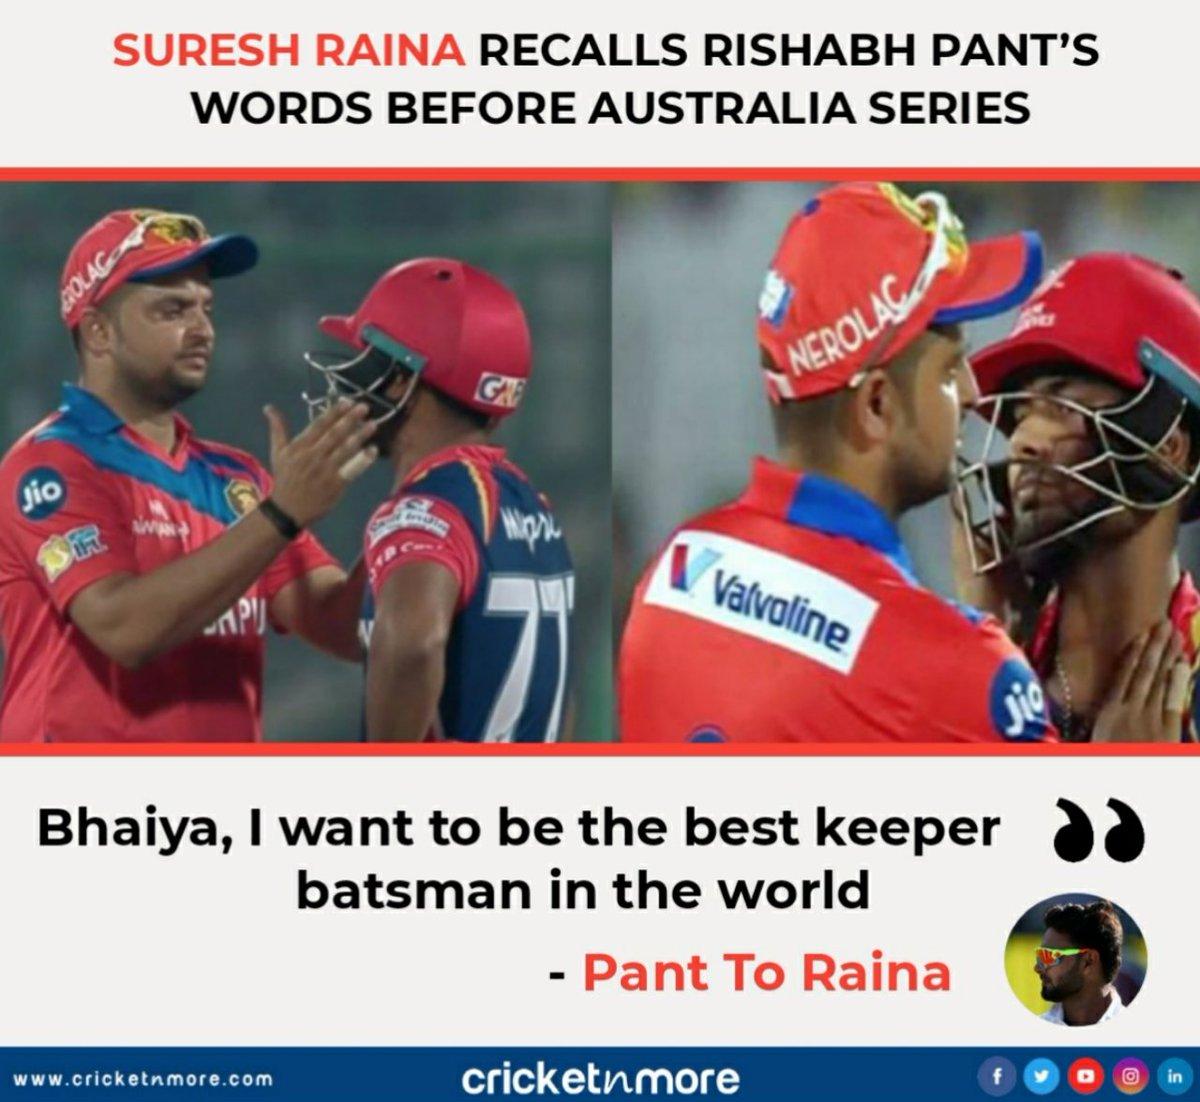 Rishabh Pant's Words before moving toAustralia  Latest Cricket News @  . . #ausvind #indiancricket #teamindia #rishabhpant #sureshraina